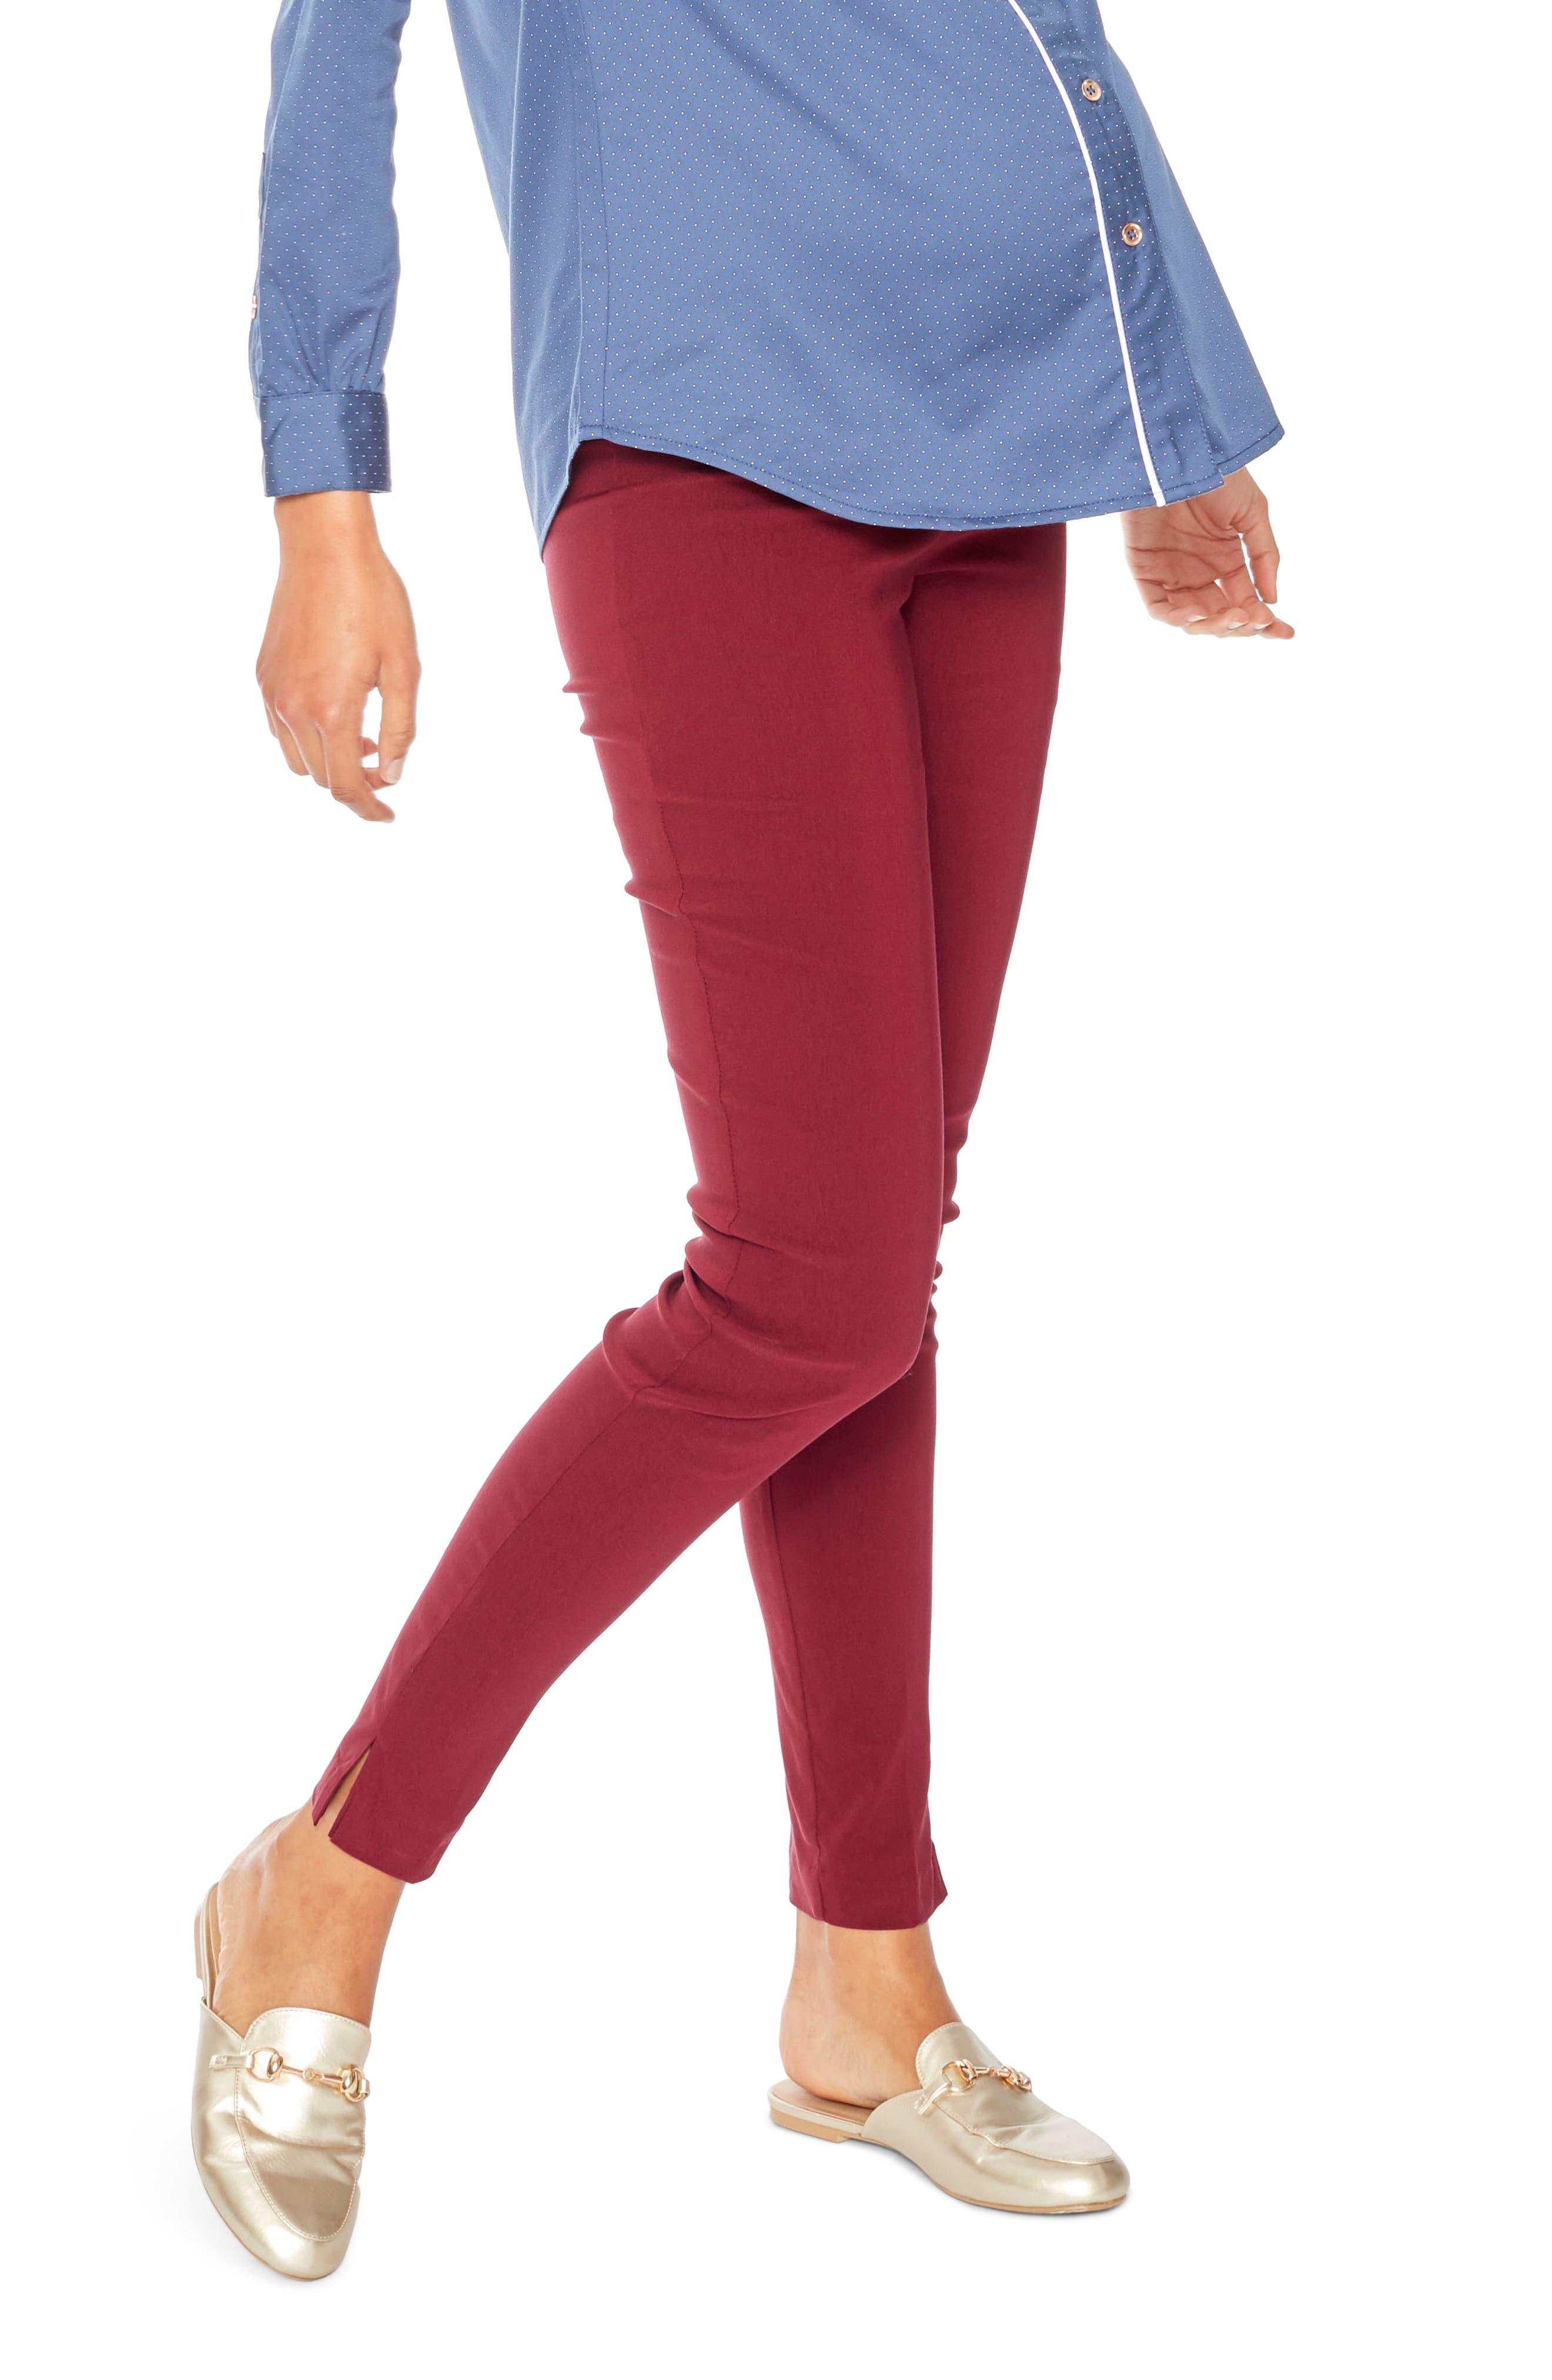 Pret Skinny Maternity Pants,                         Main,                         color, Wine